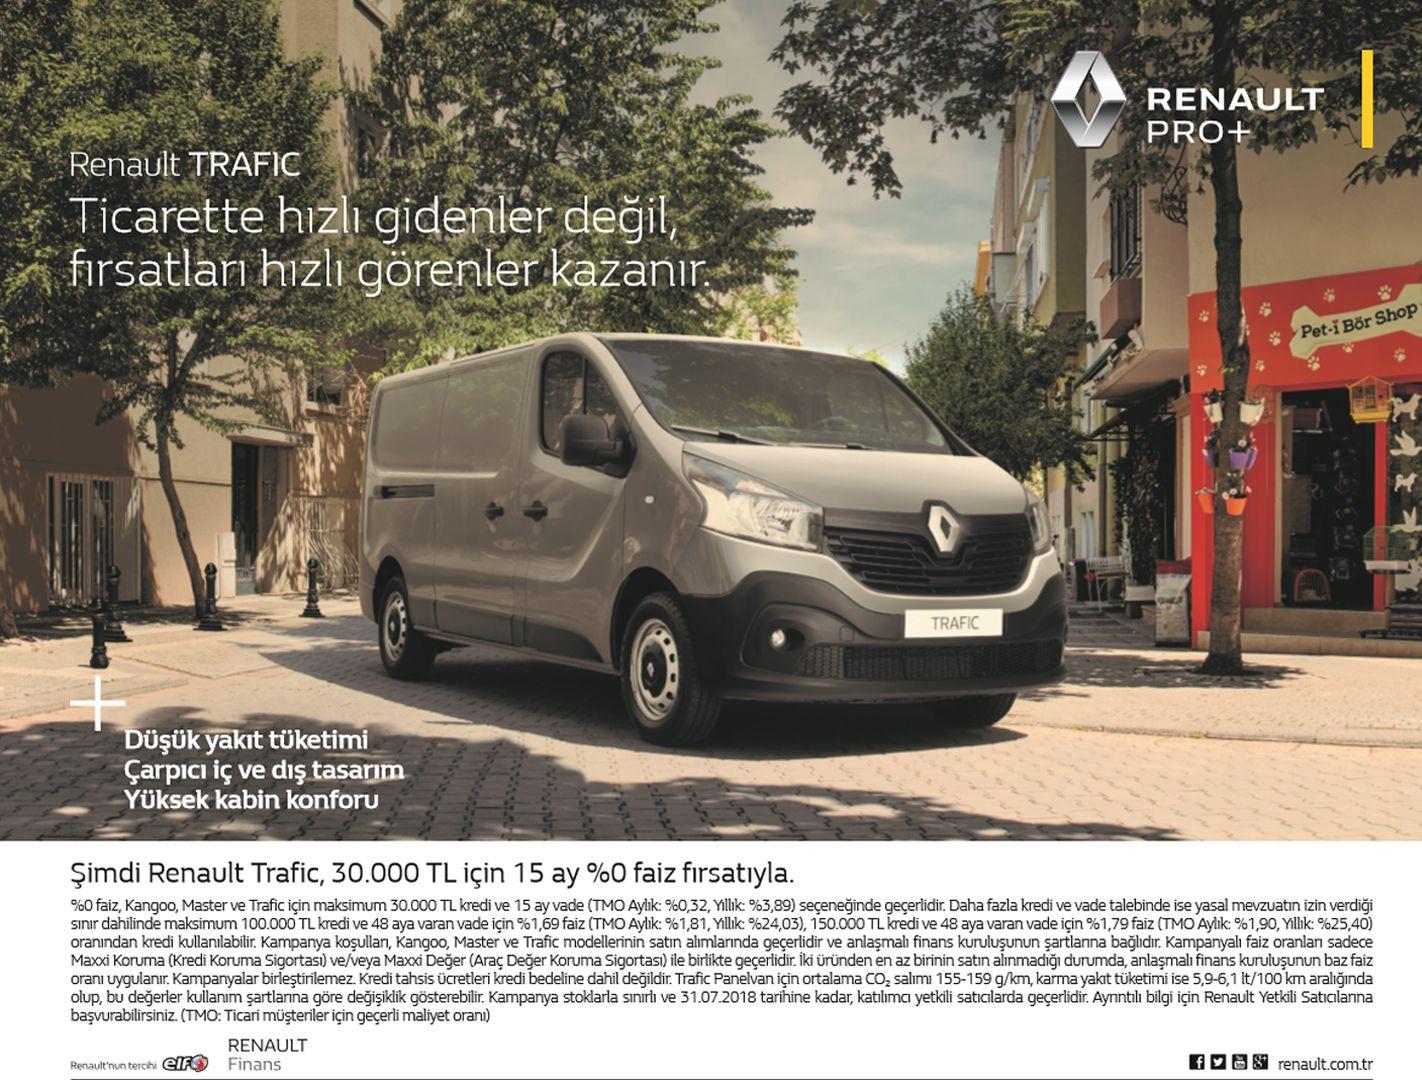 Renault Trafic Ticarette Hizli Gidenler Degil Firsatlari Hizli Gorenler Kazanir Simdi Renault Trafic 30 000 Tl Icin 15 Ay 0 Faiz Firsati Simsek Ford Kamyon